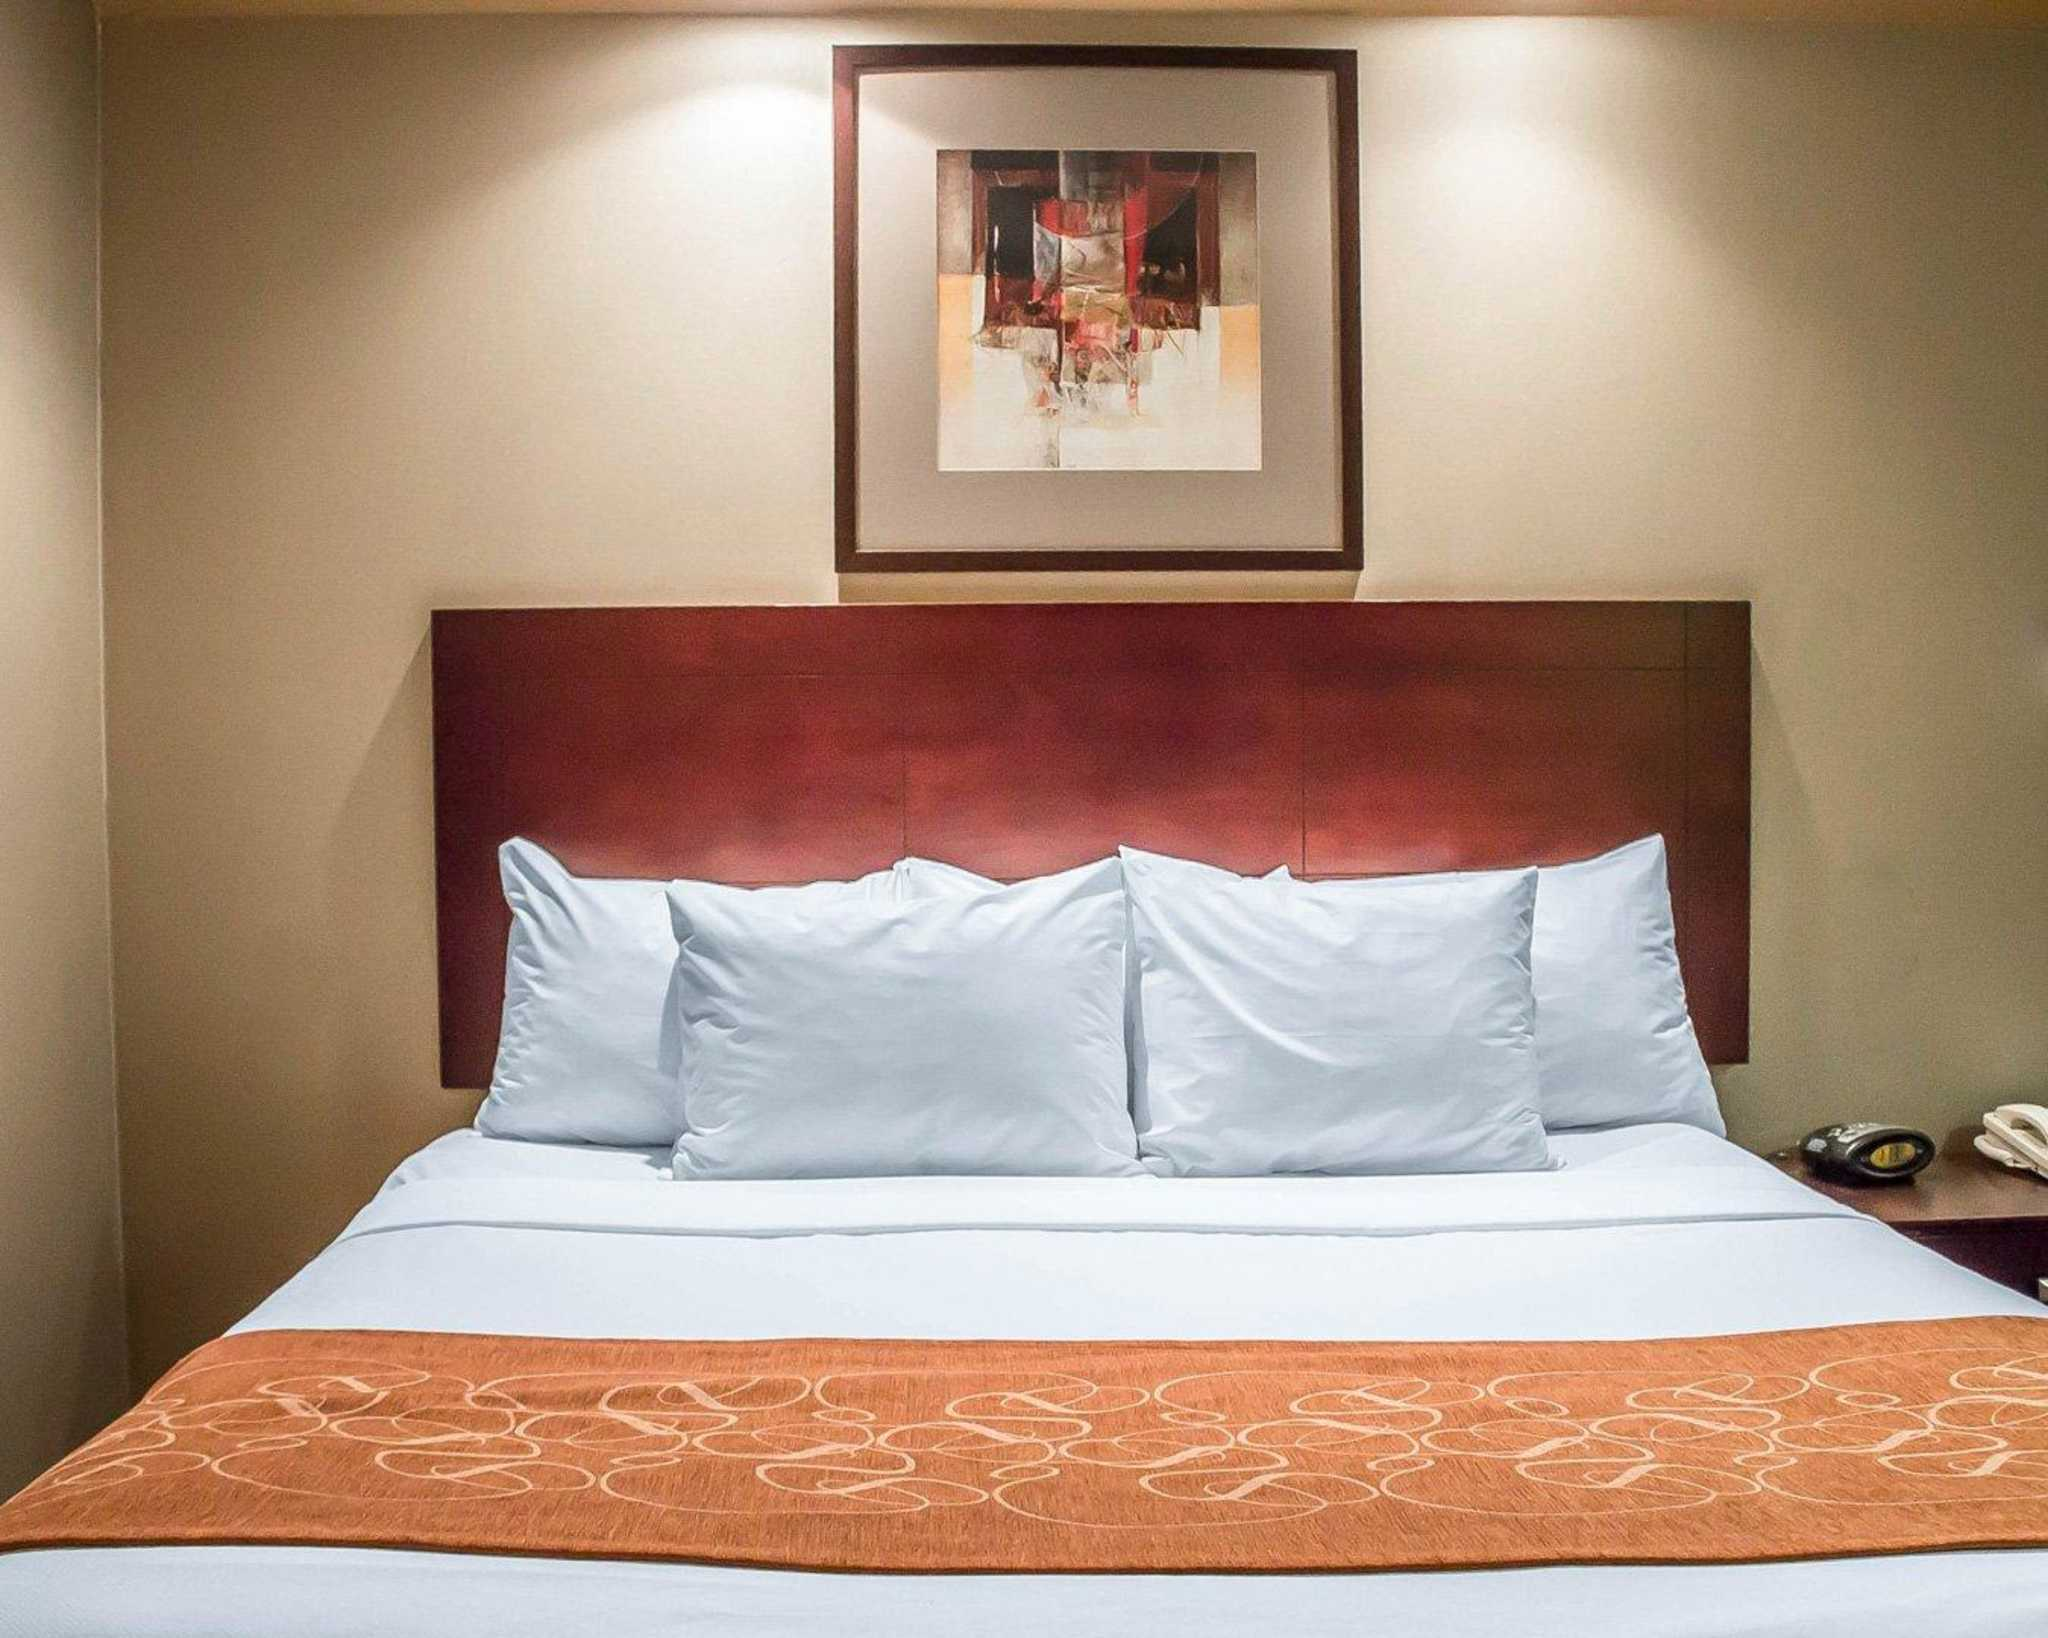 Comfort Suites Perrysburg - Toledo South image 3